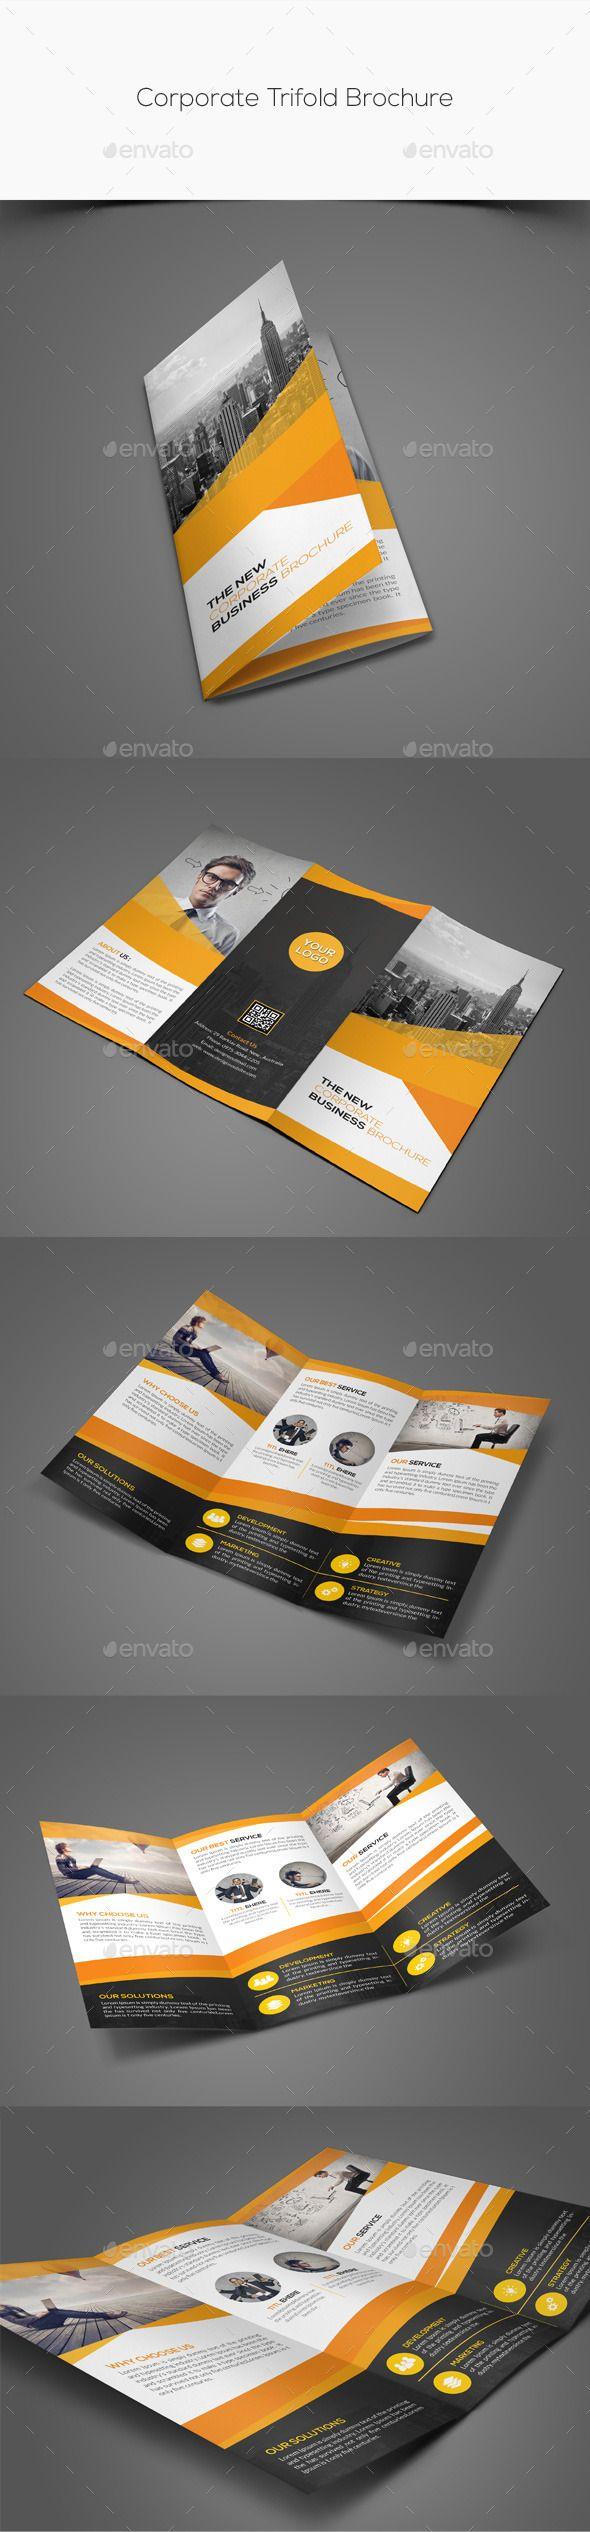 Corporate Trifold Brochure Template #brochure Download: http://graphicriver.net/item/corporate-trifold-brochure/11554073?ref=ksioks